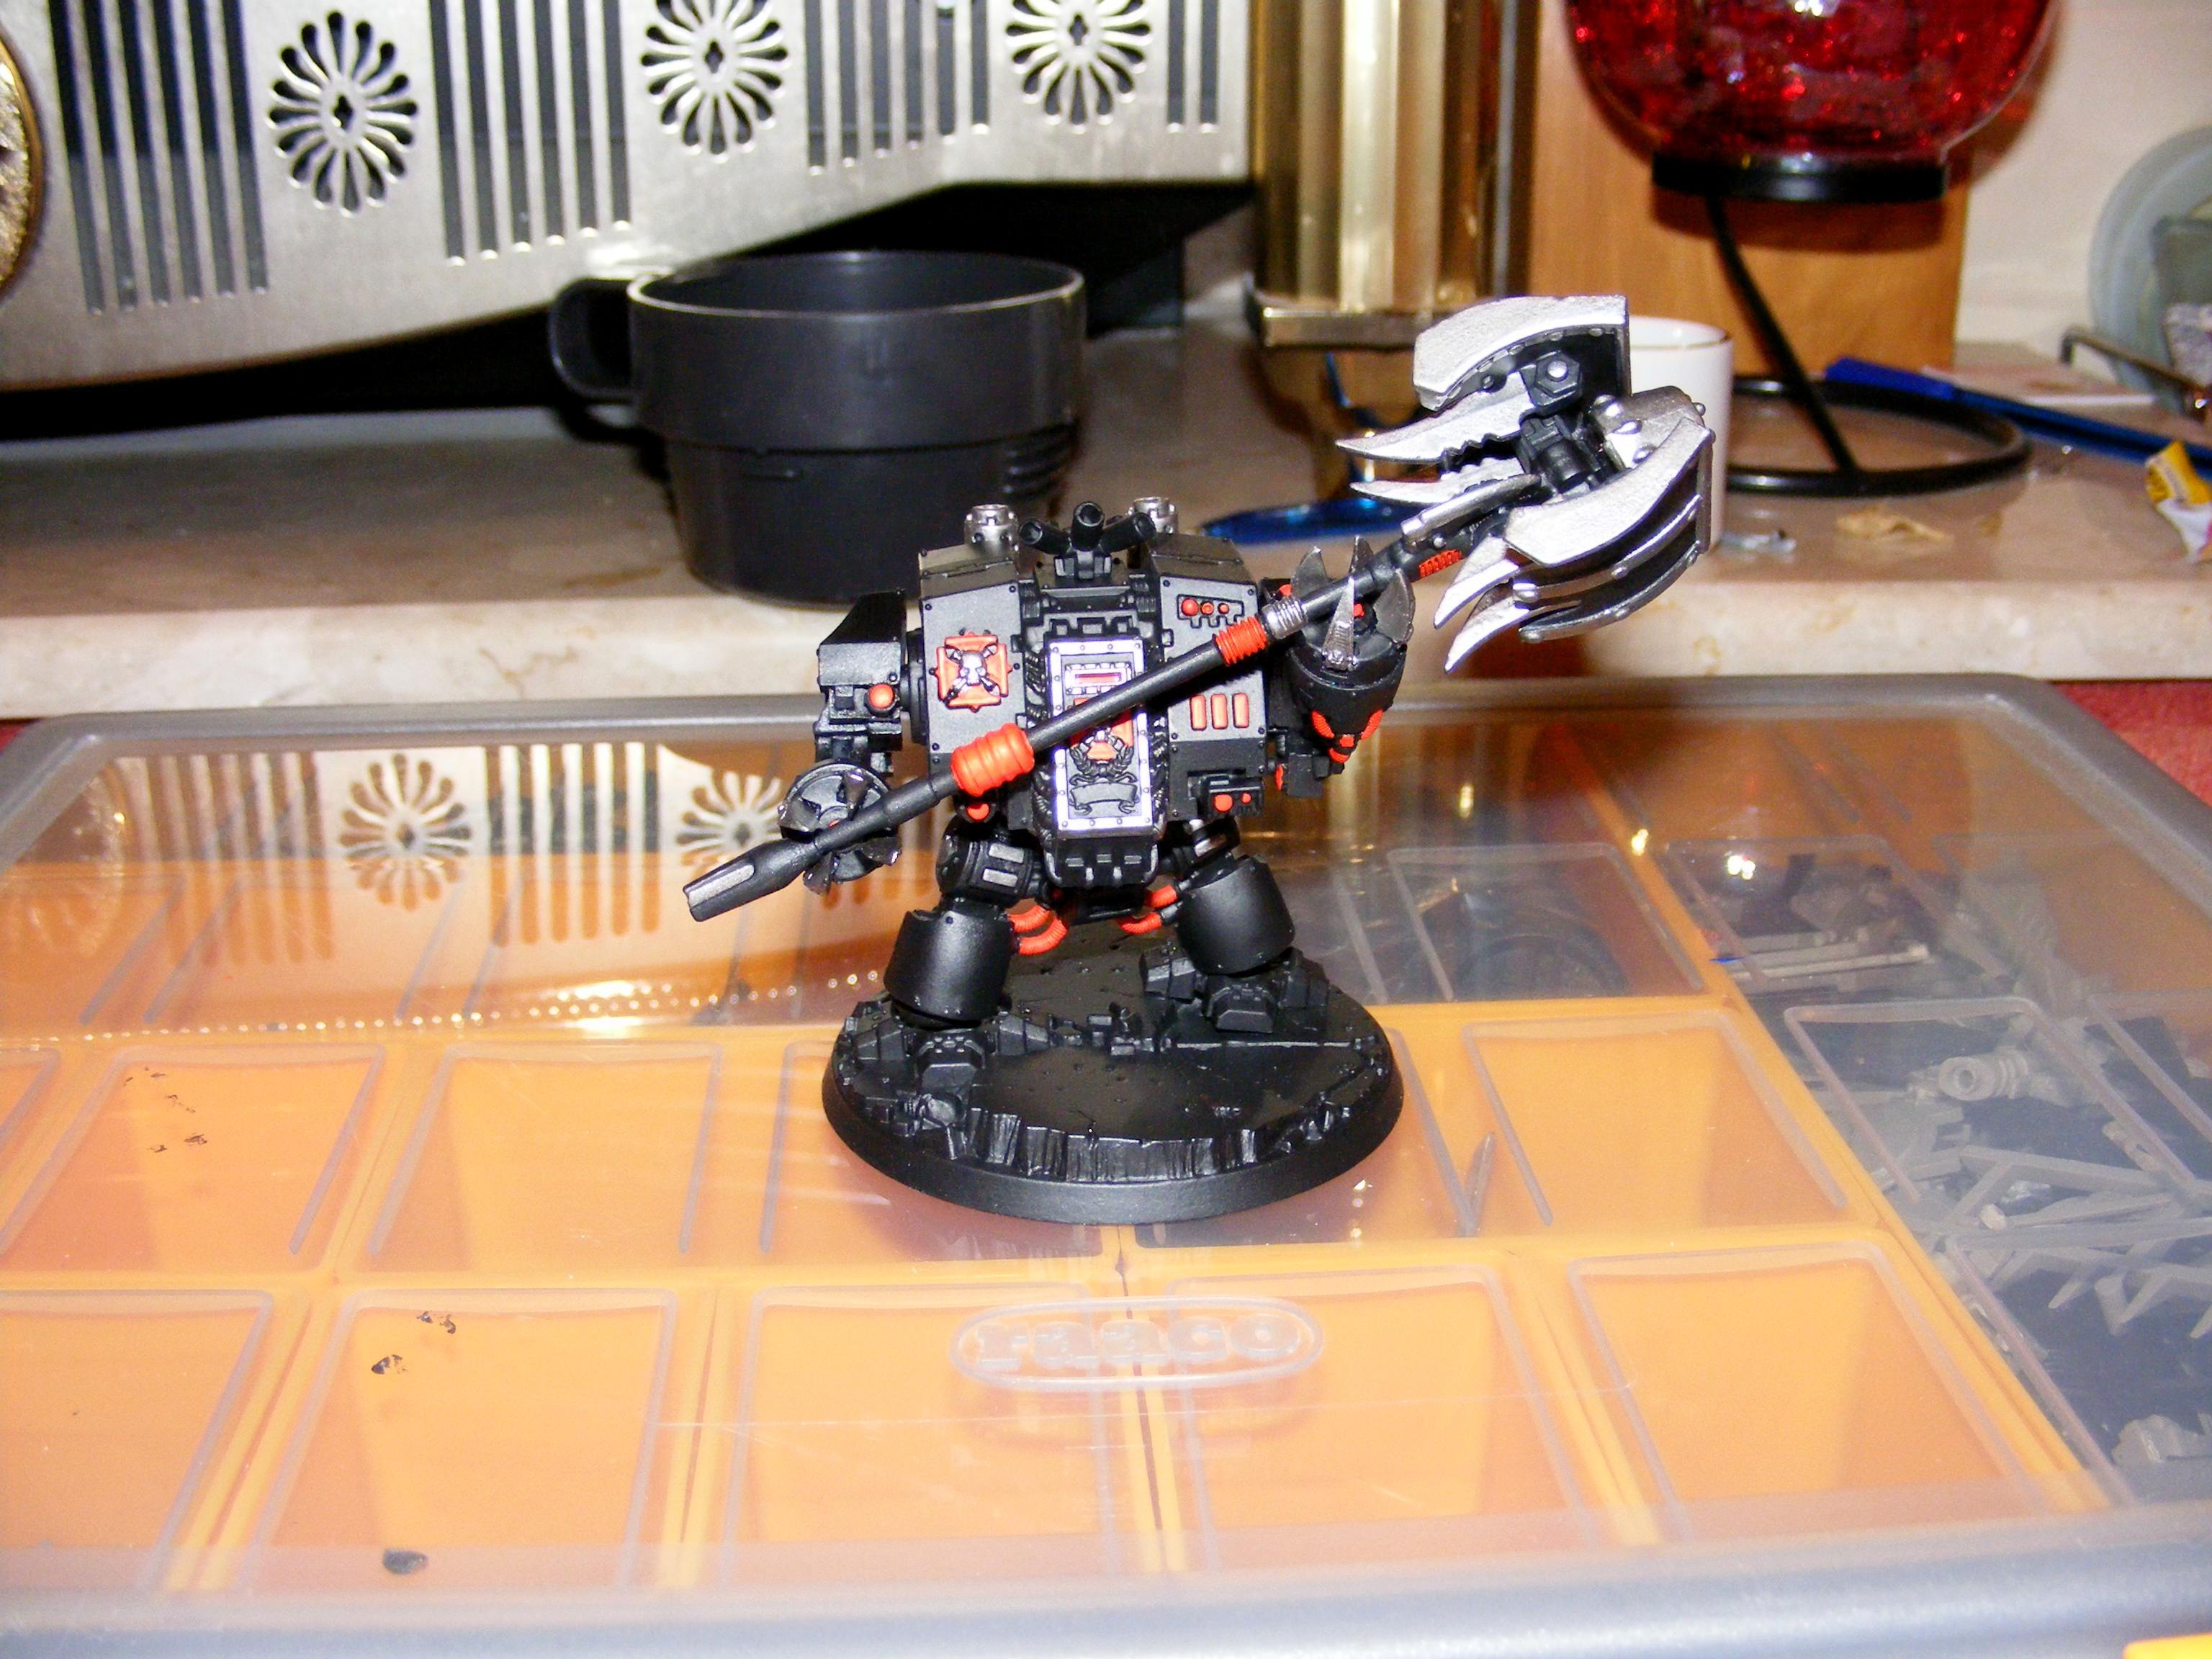 Custom, Custom Build, Dreadnought, Iron Clad, Ironclad, Scratch Build, Seismic Hammer, Space Marines, Work In Progress